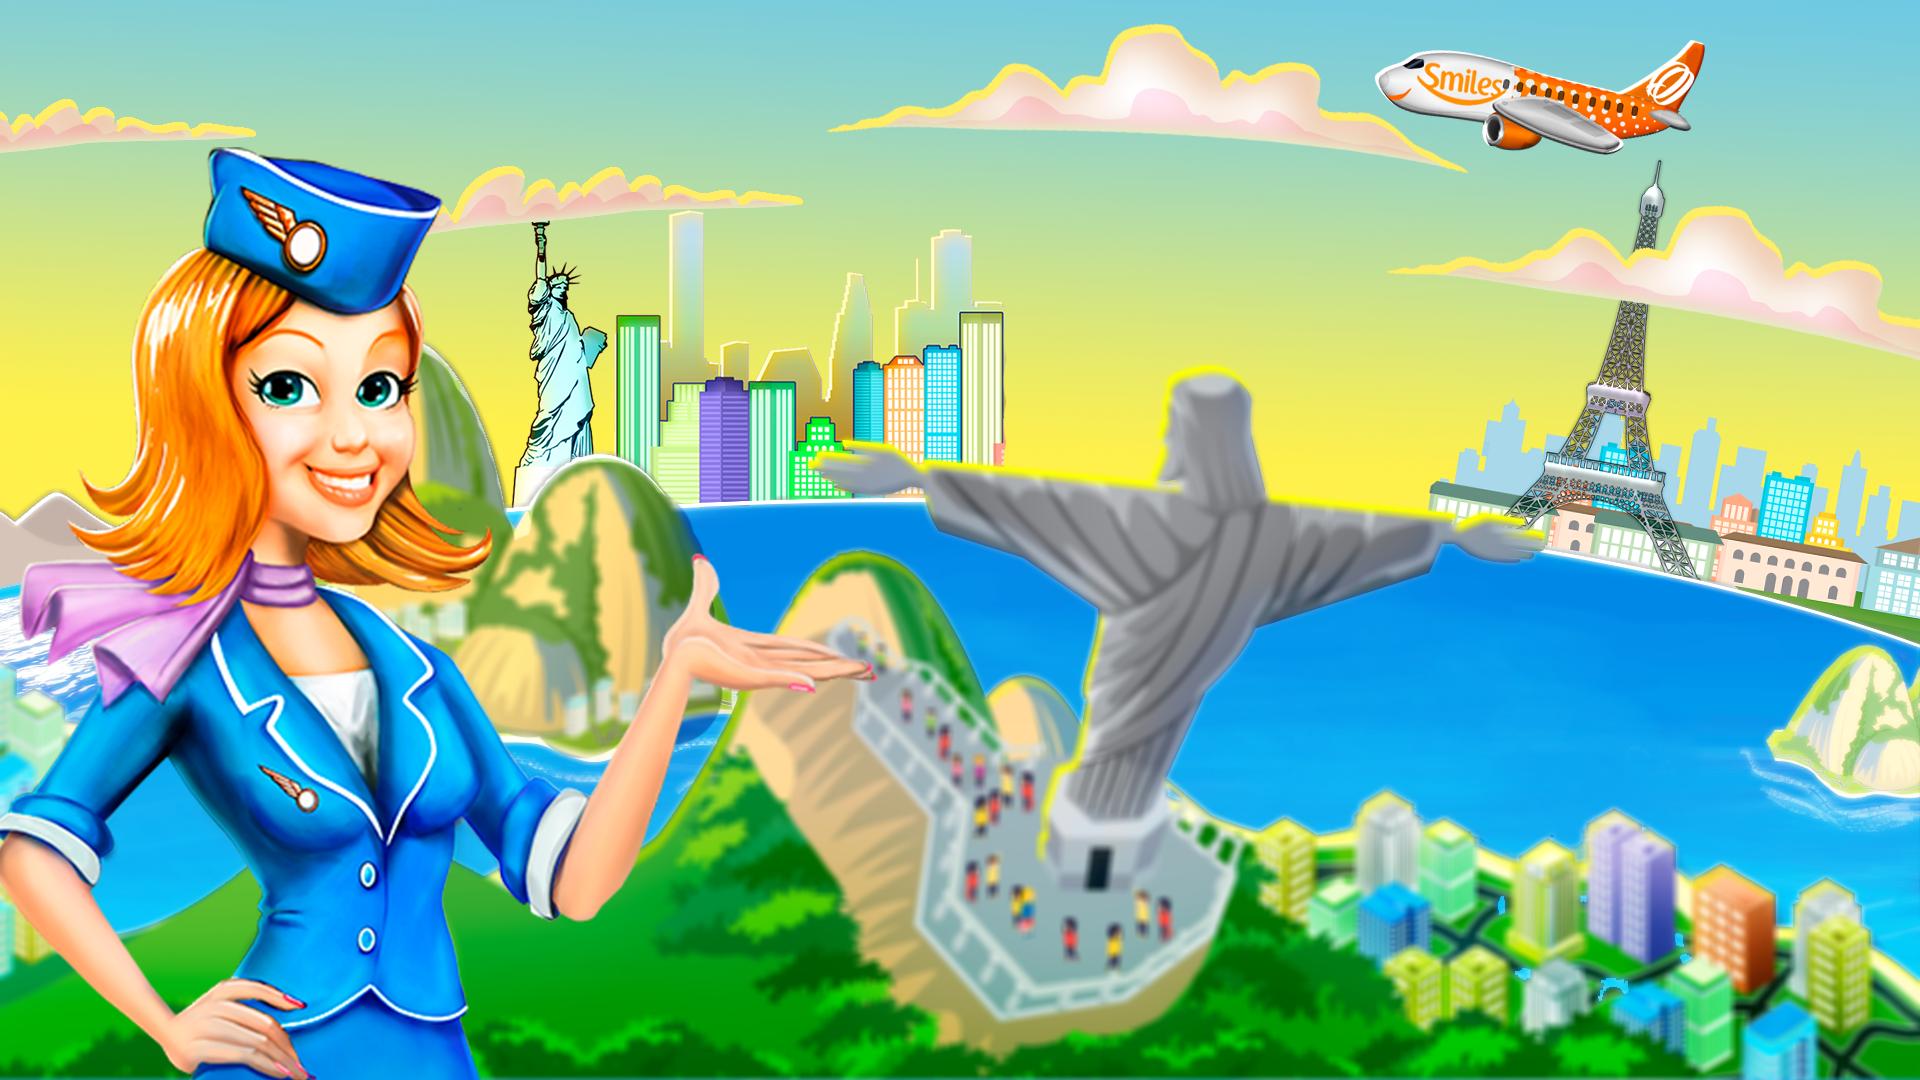 Game design City Sky Hotel (Prototype)